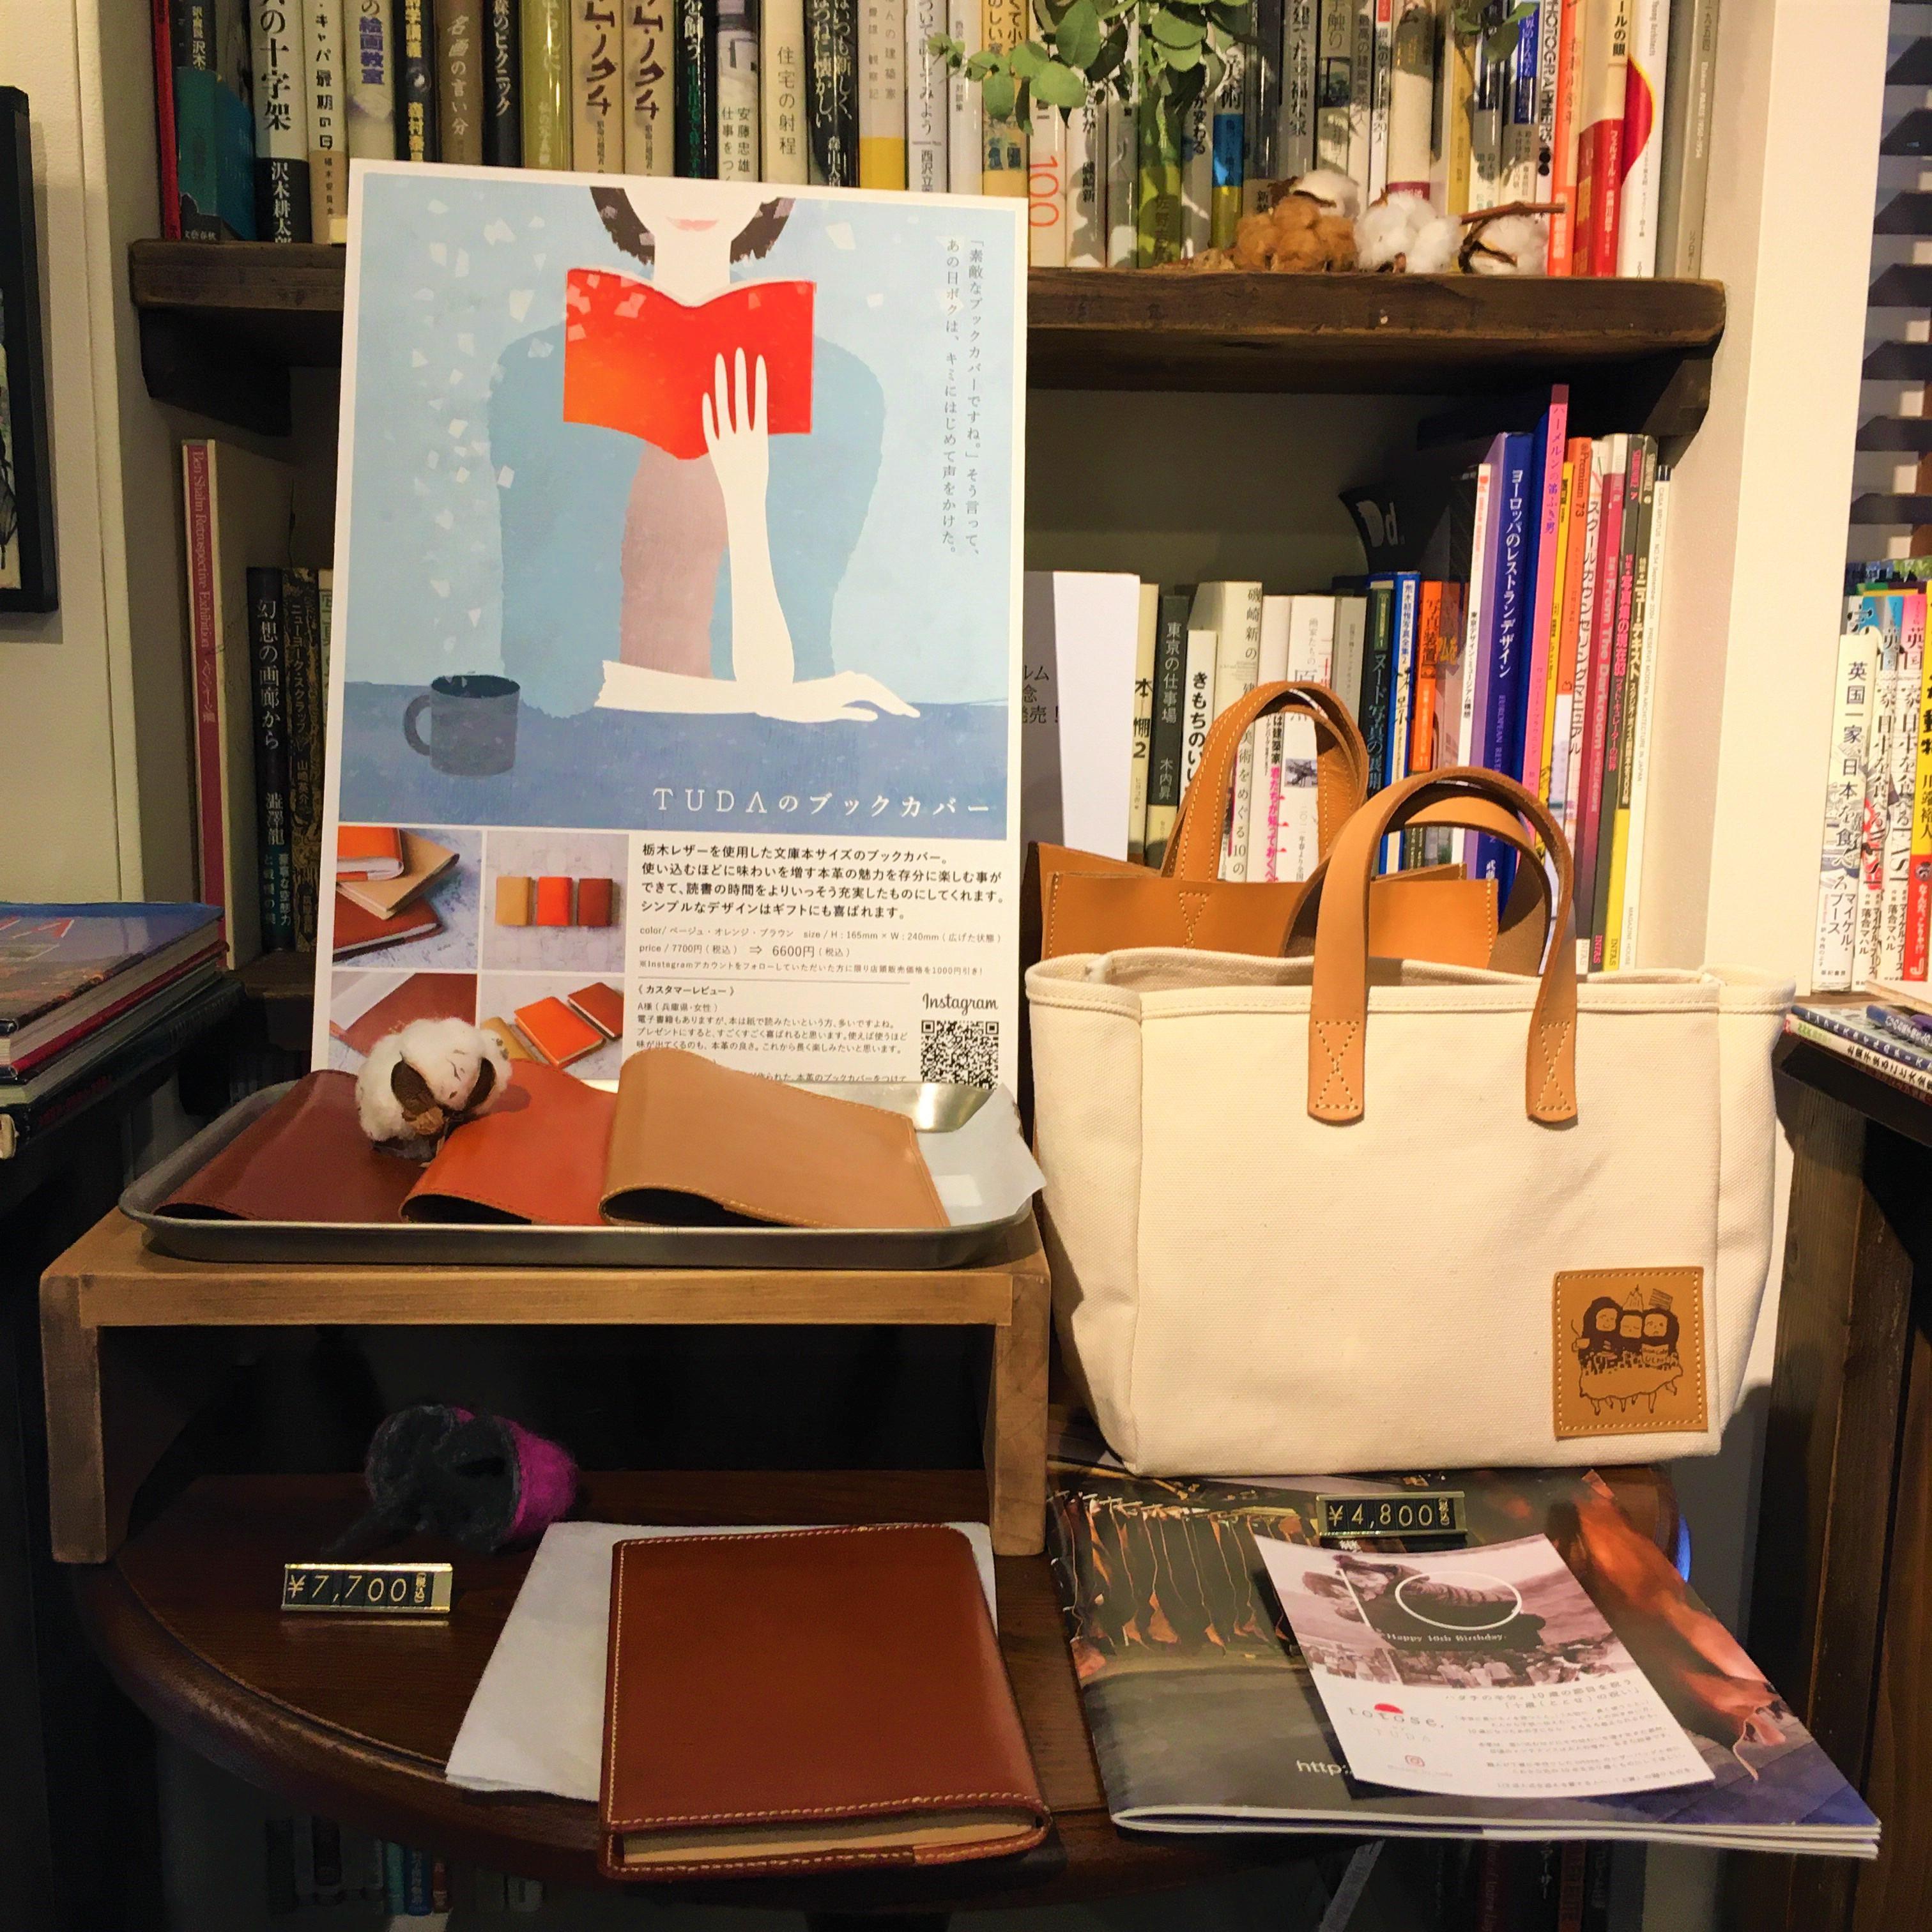 TUDAのブックカバー(文庫本サイズ)が買えるお店が神戸にあります。